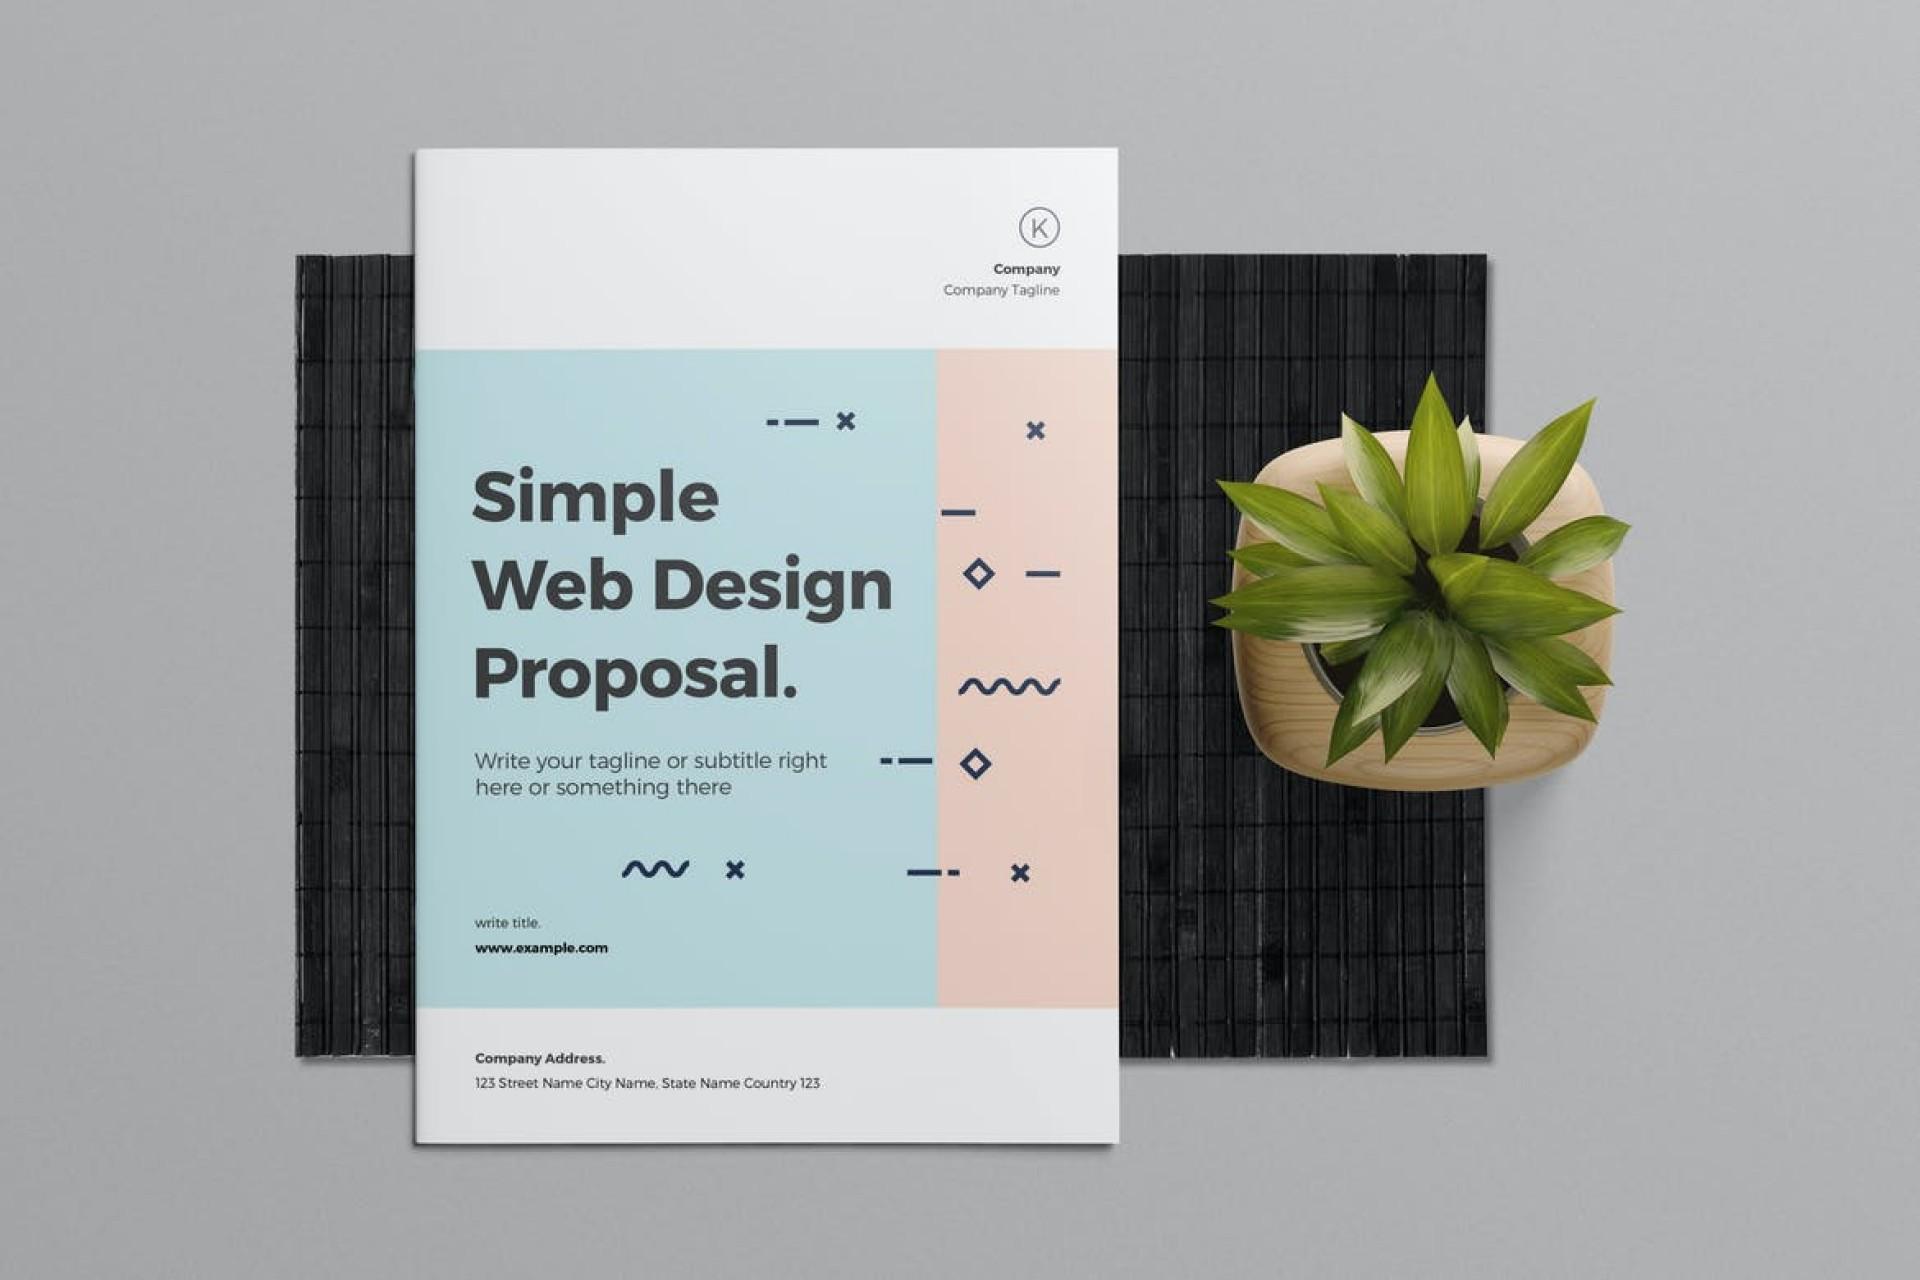 006 Impressive Web Design Proposal Template Indesign High Resolution 1920